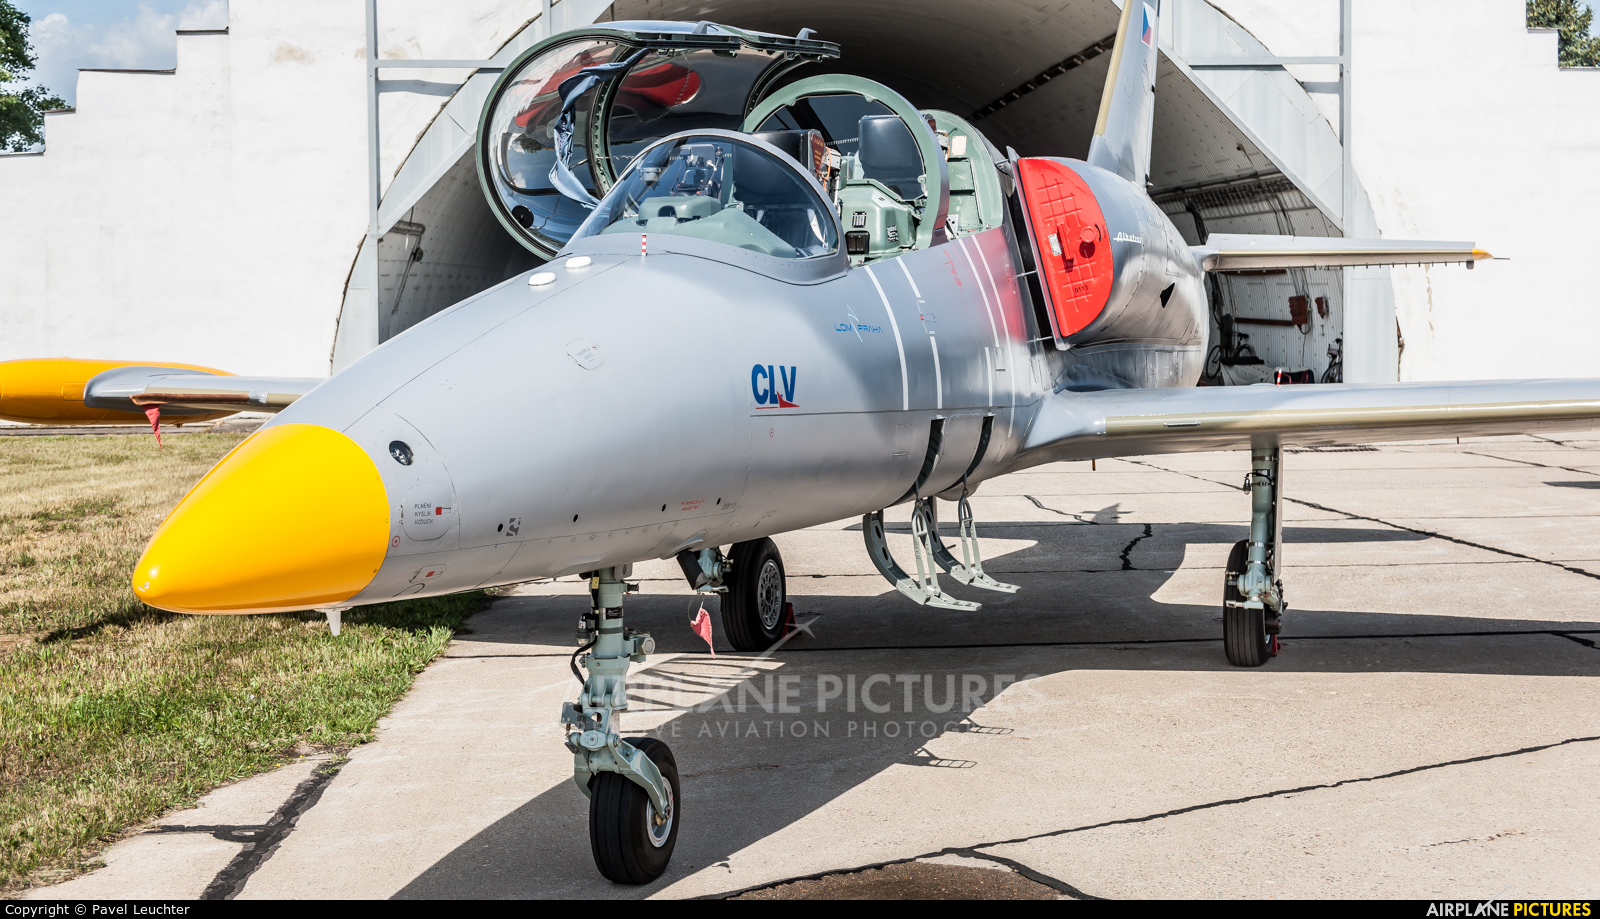 Czech - Air Force 0113 aircraft at Pardubice